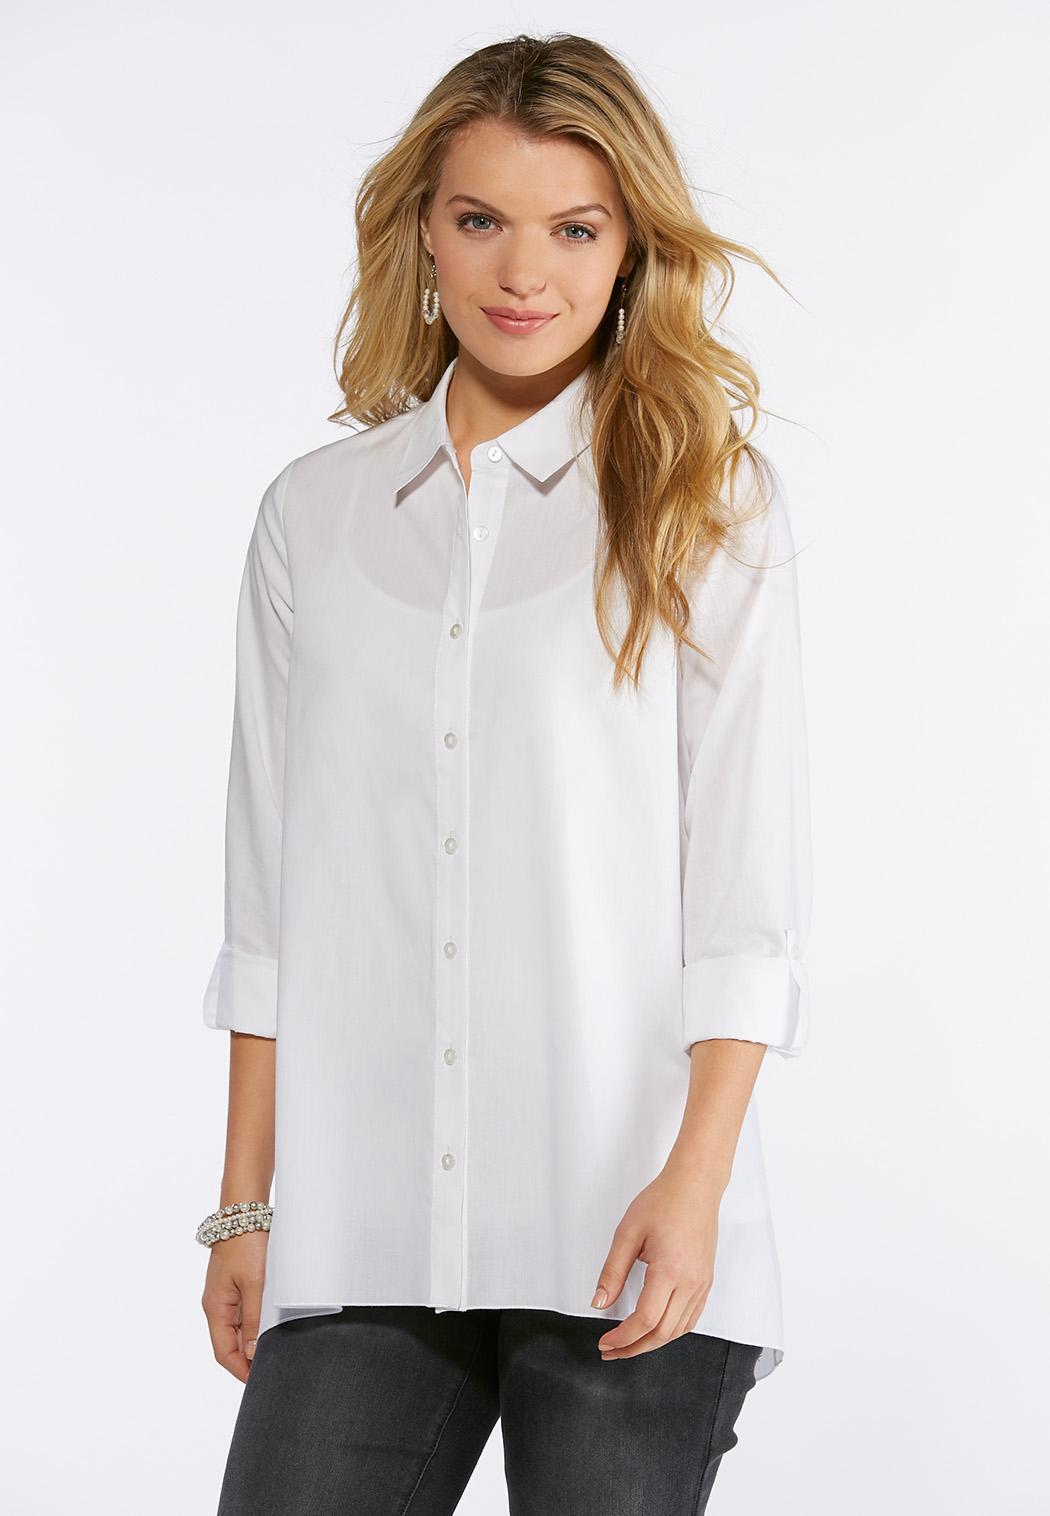 White Button Down Tunic Top